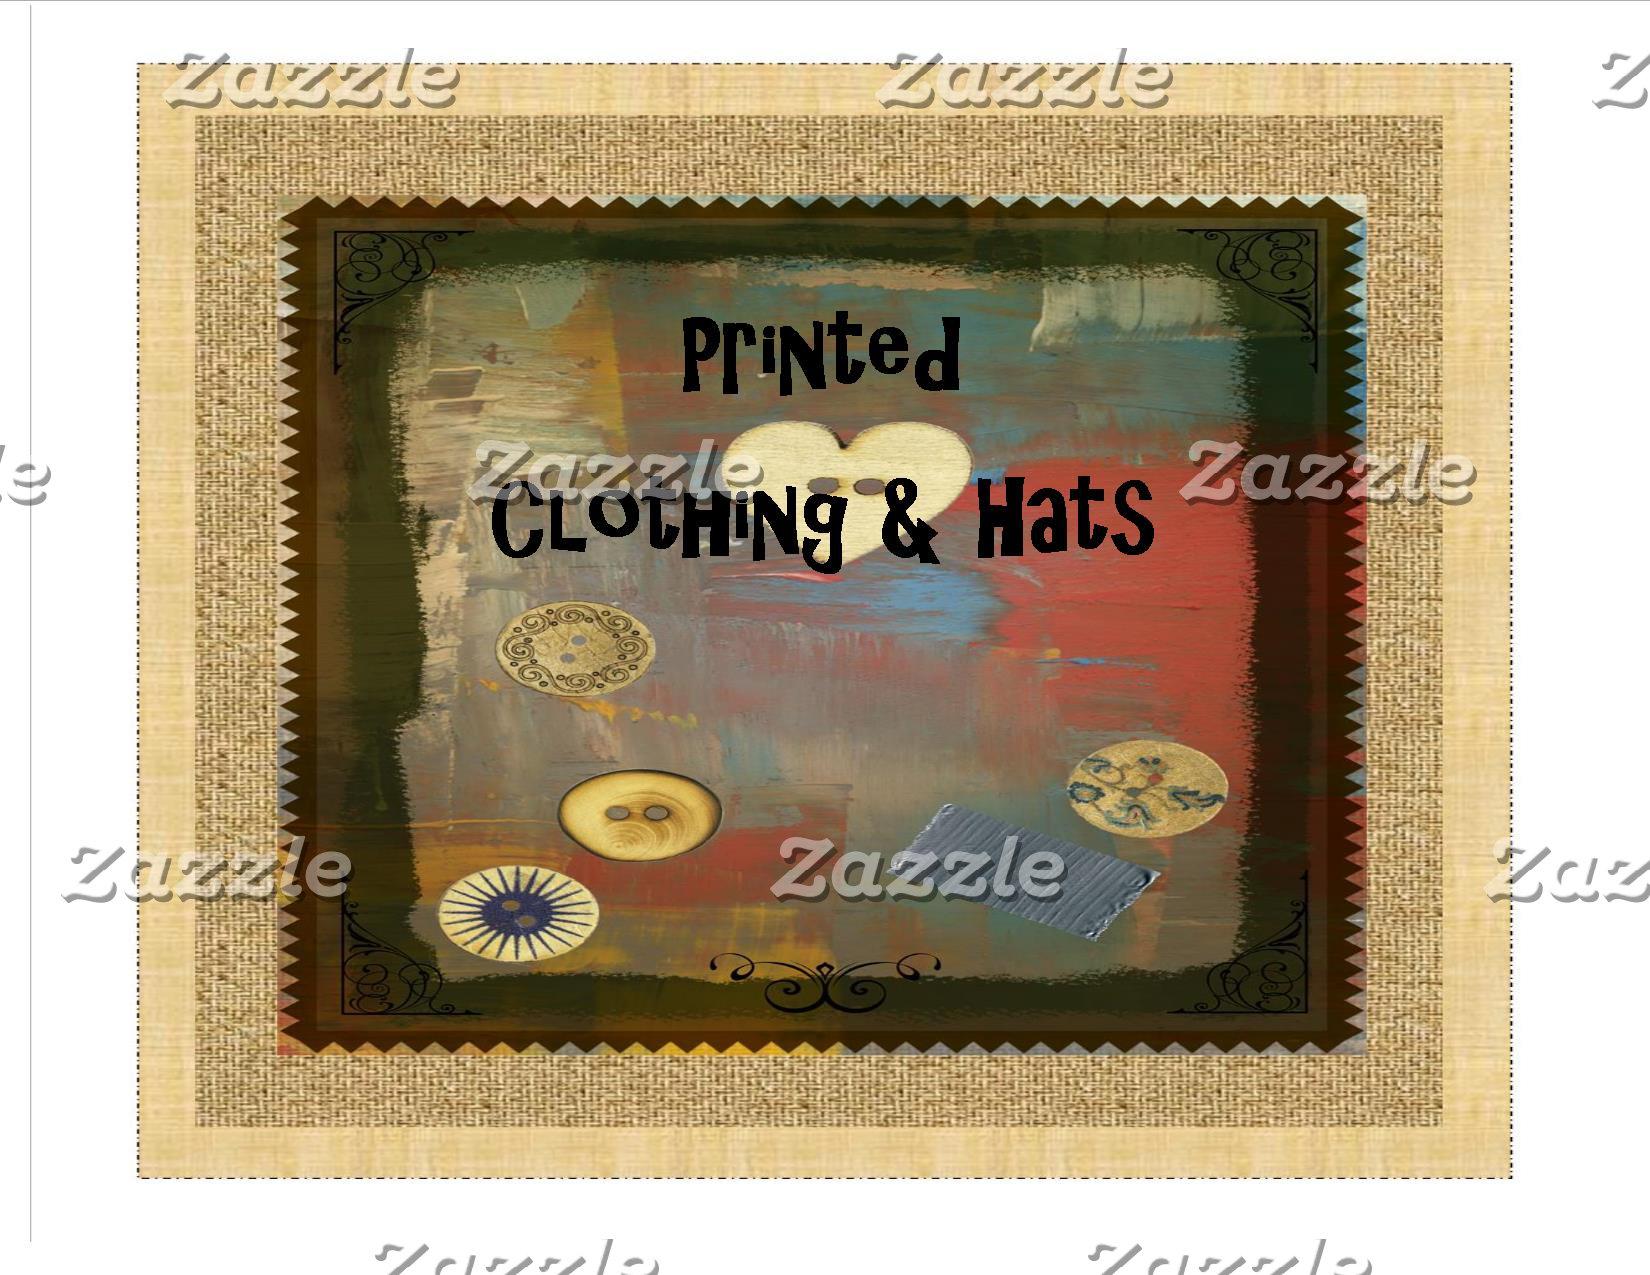 Clothing & Hats